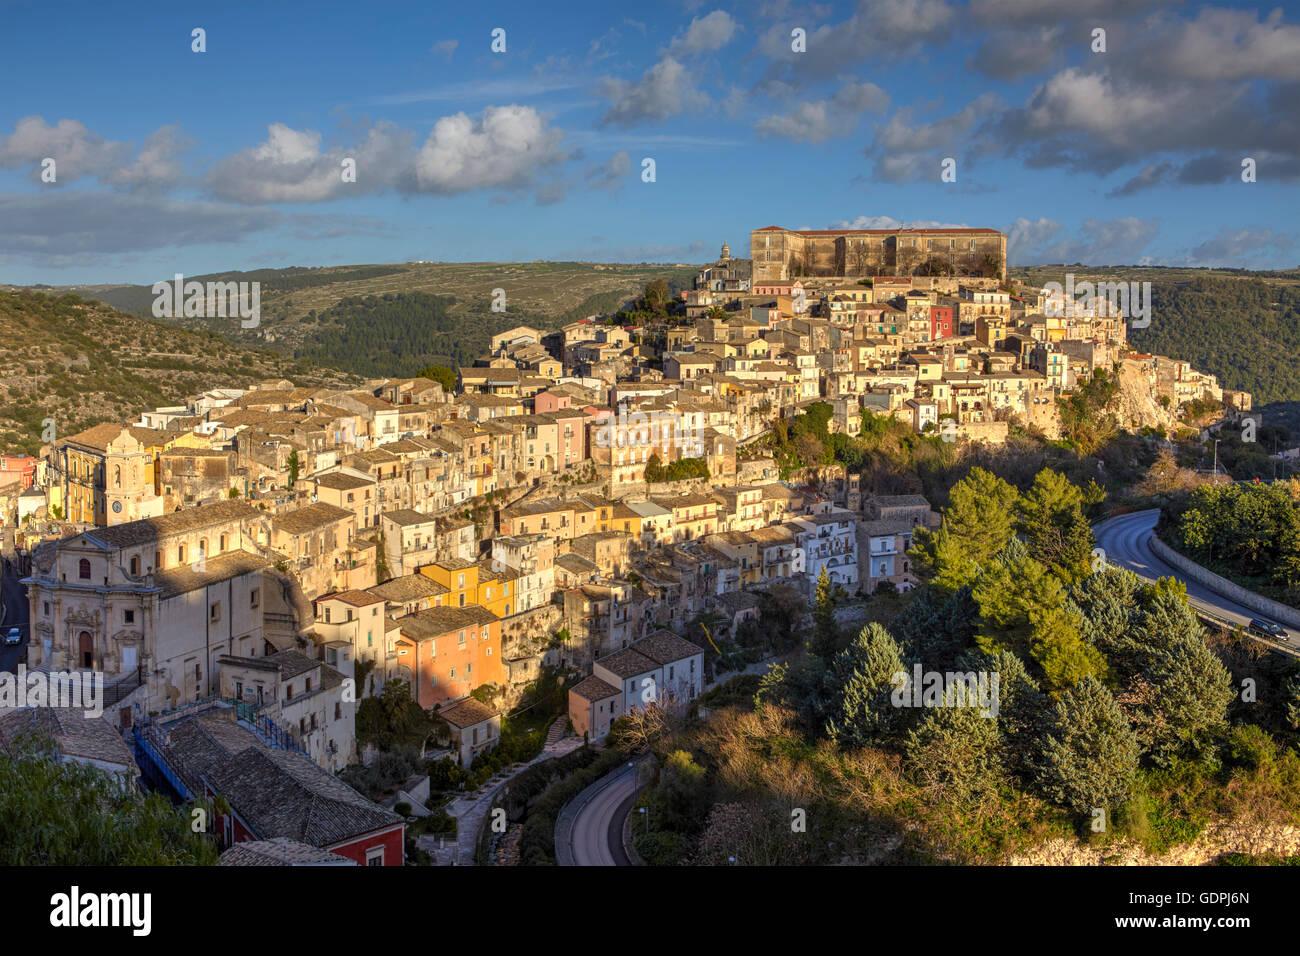 La ville de Ragusa Ibla, Sicile, Italie Photo Stock